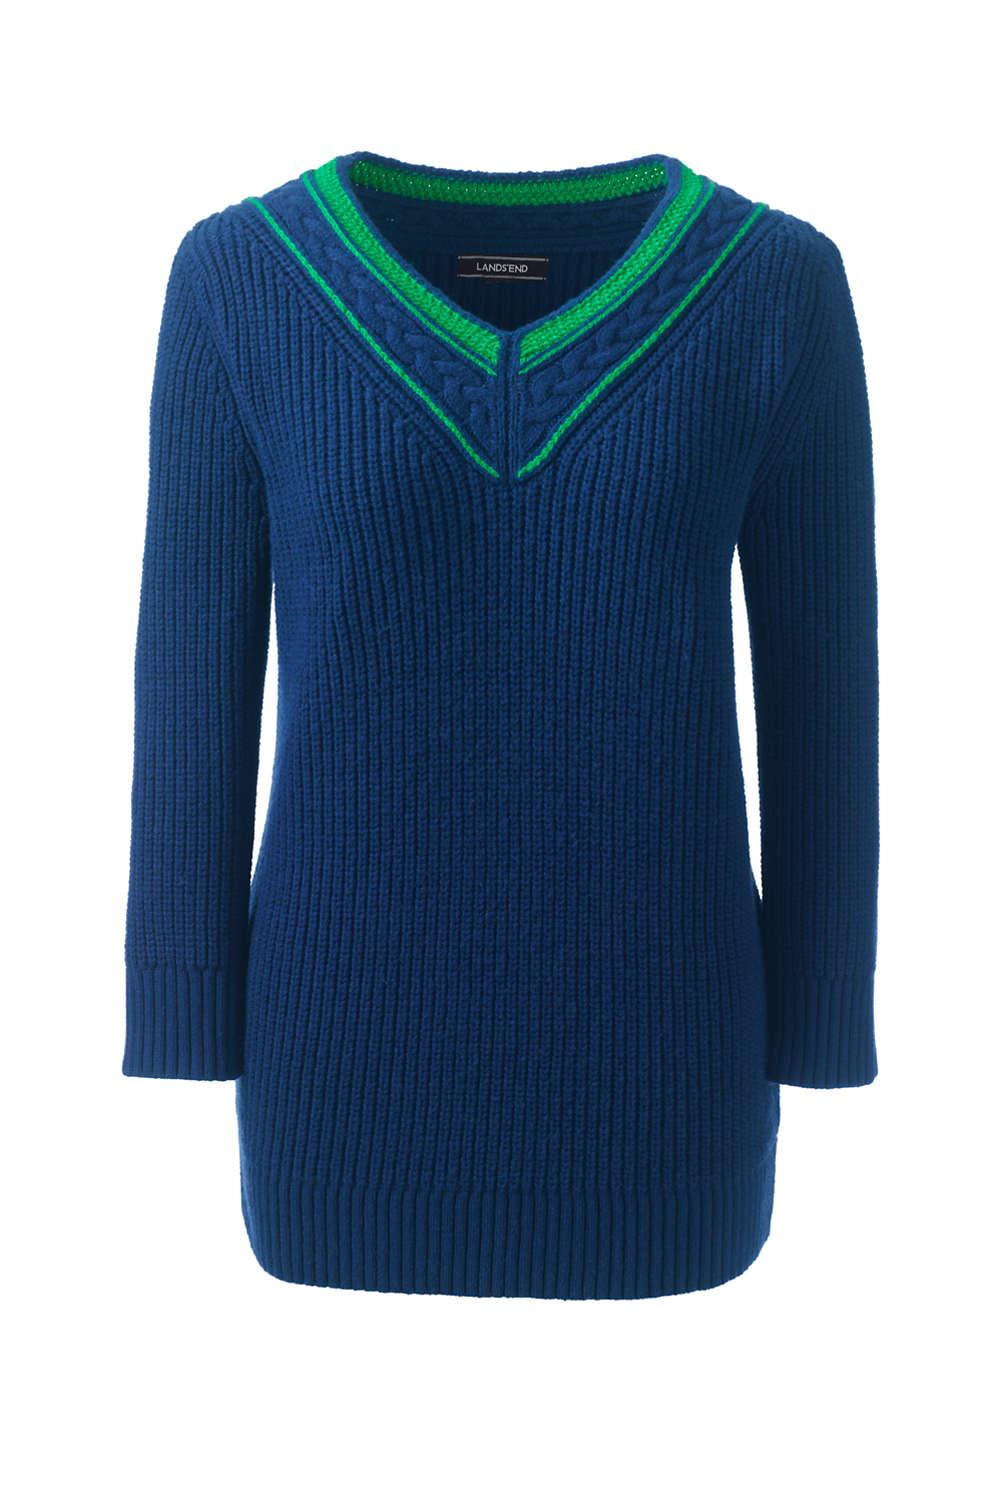 99a81dc910 Women s Lofty Blend 3 4 Sleeve V-neck Sweater from Lands  End